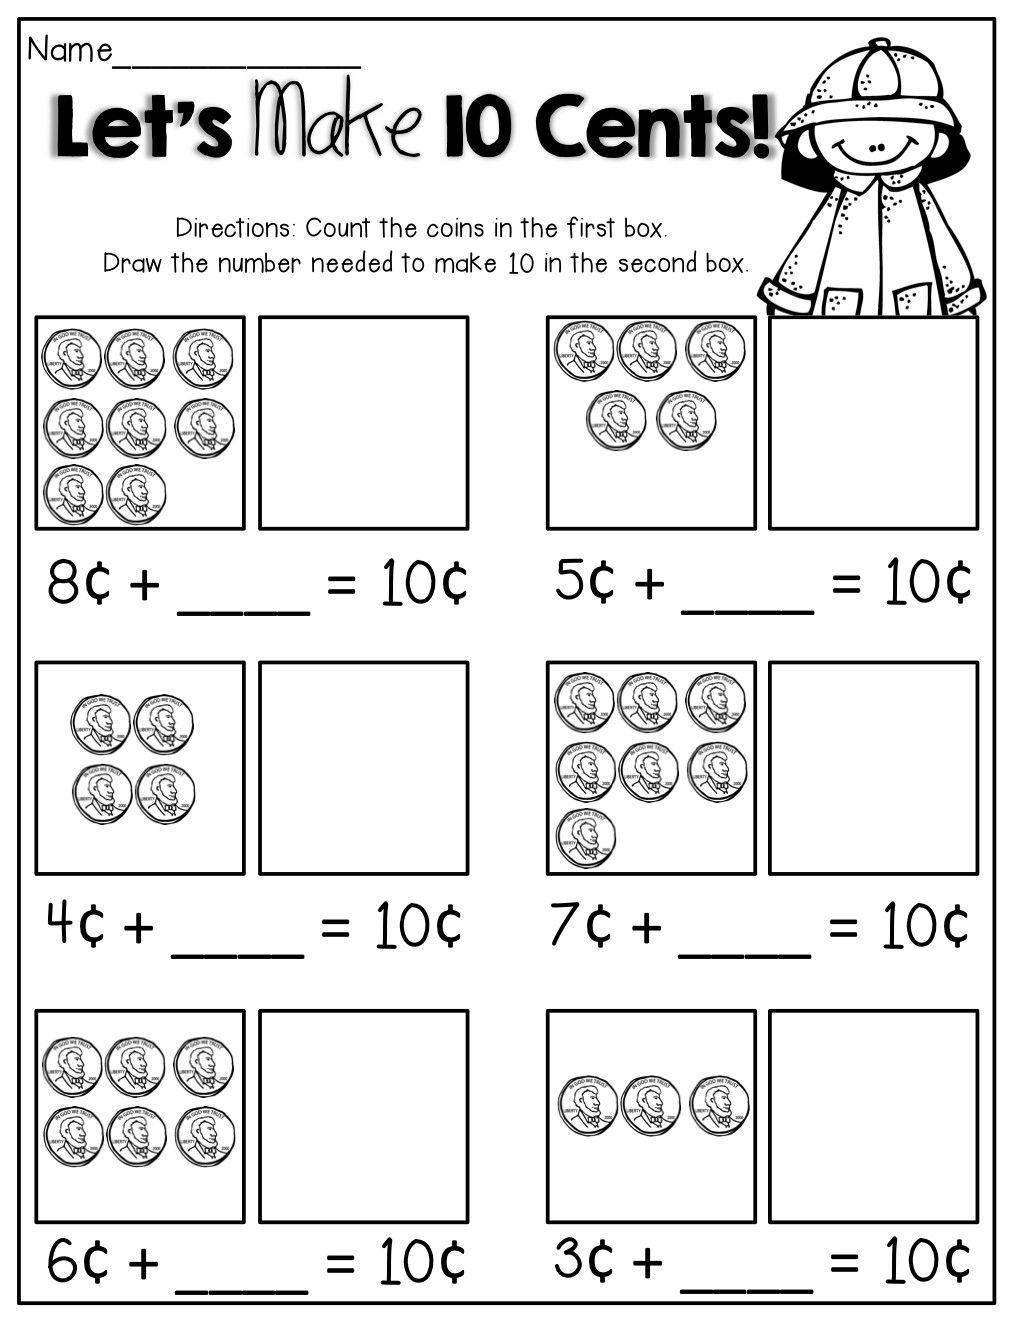 Wilson Reading Program Worksheets Worksheet For Teacher In 2020 Wilson Reading Program Learning Math Phonics Worksheets Grade 1